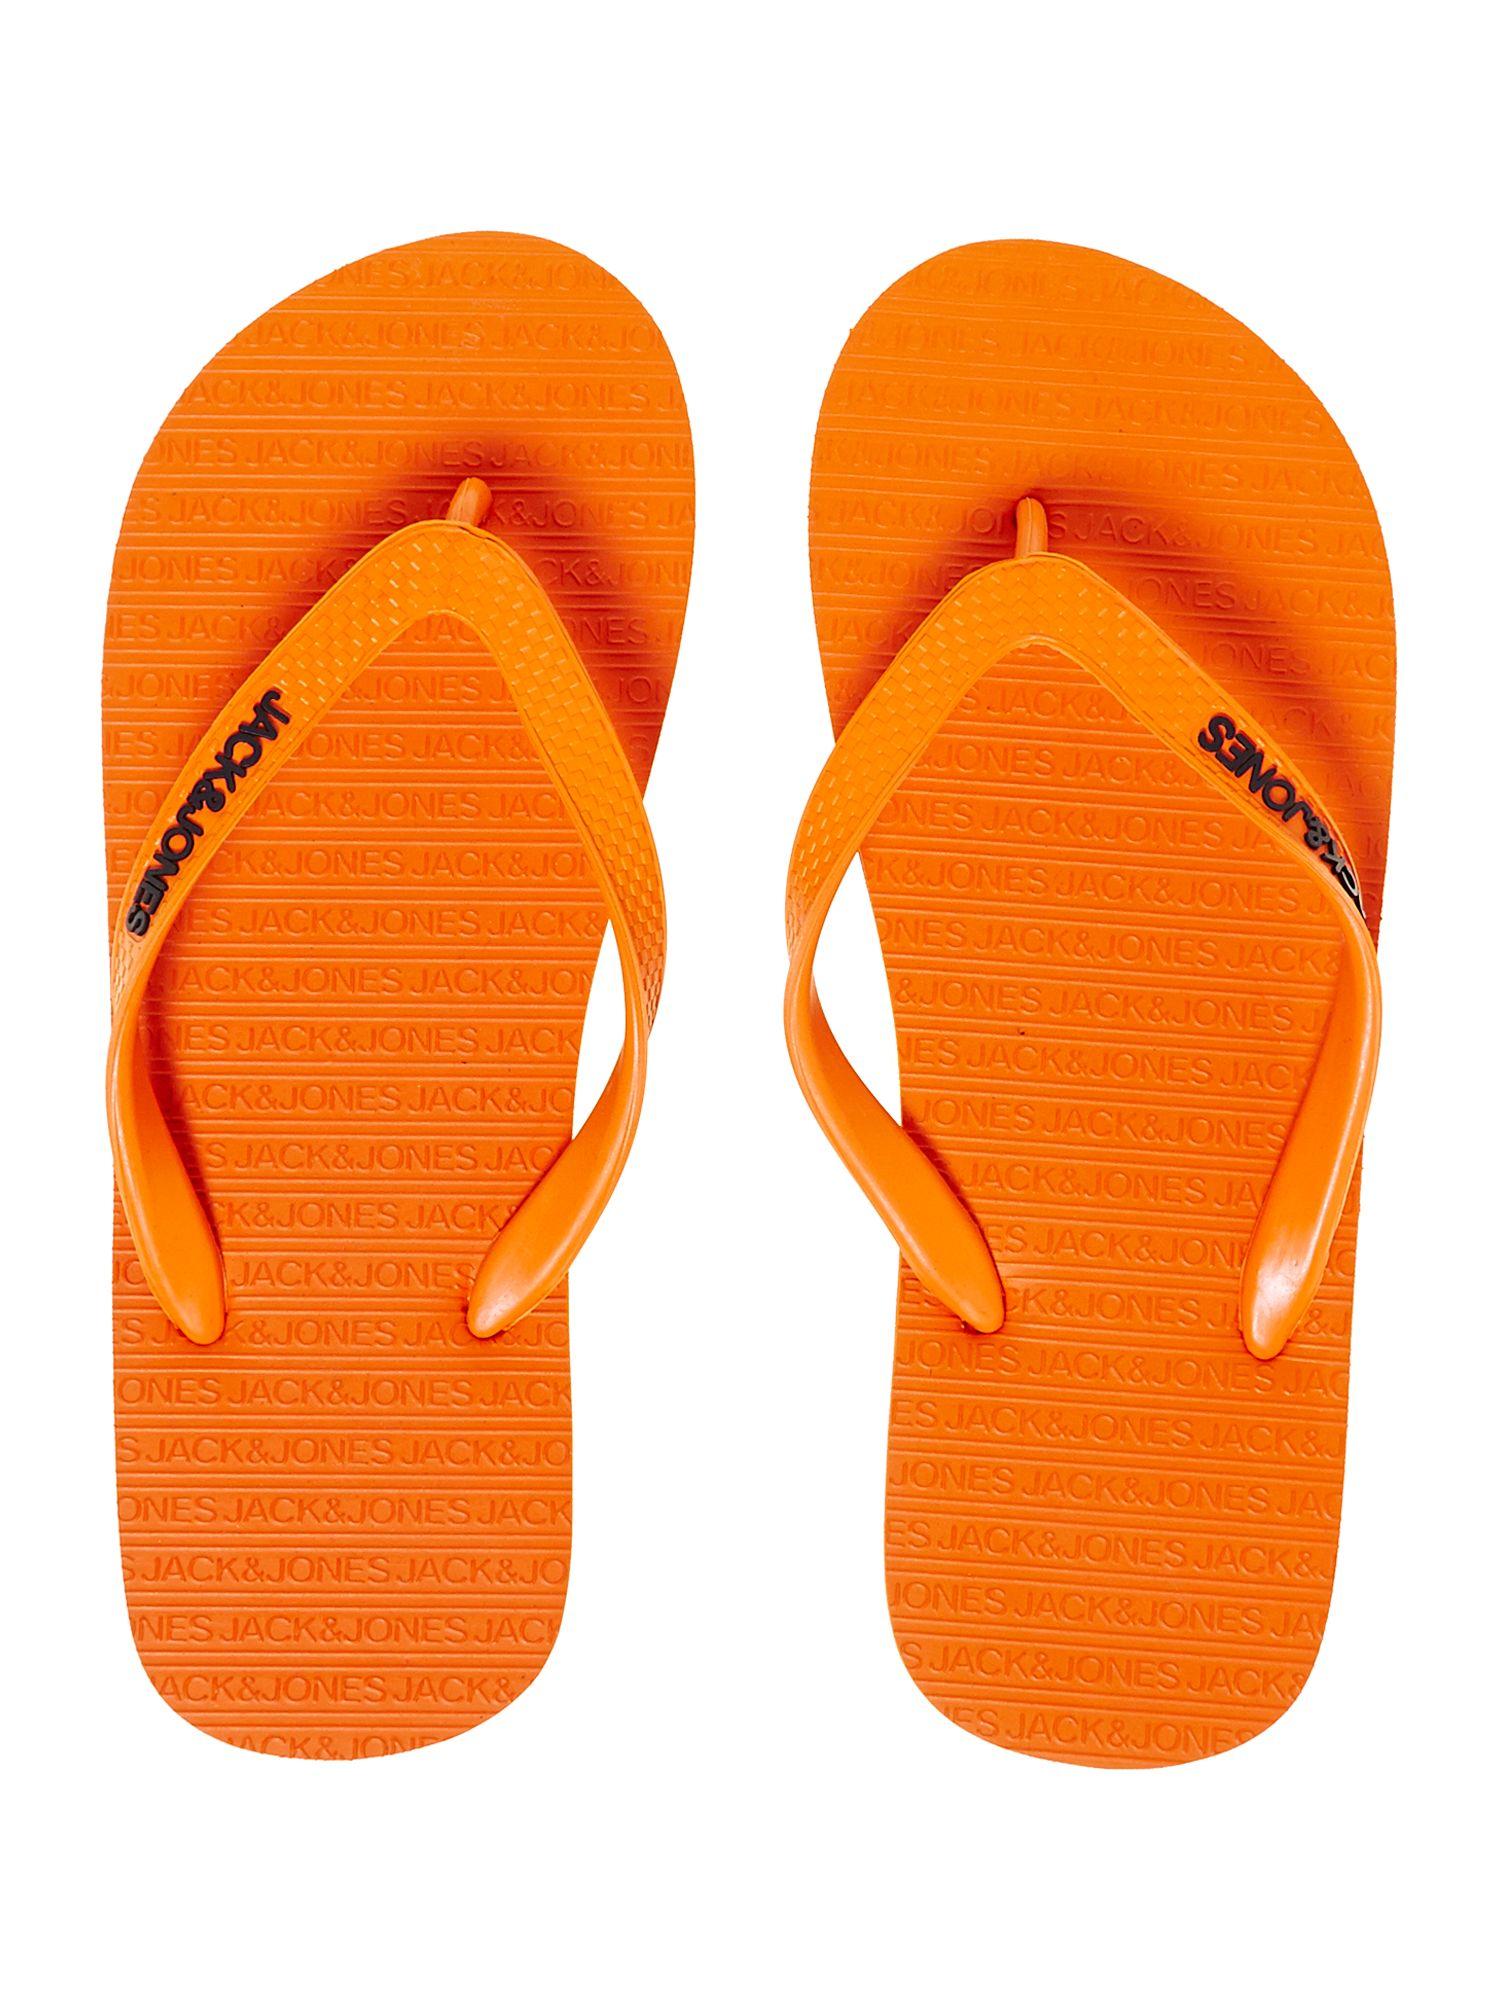 Jack amp Jones Classic Flip Flops In Orange For Men Lyst